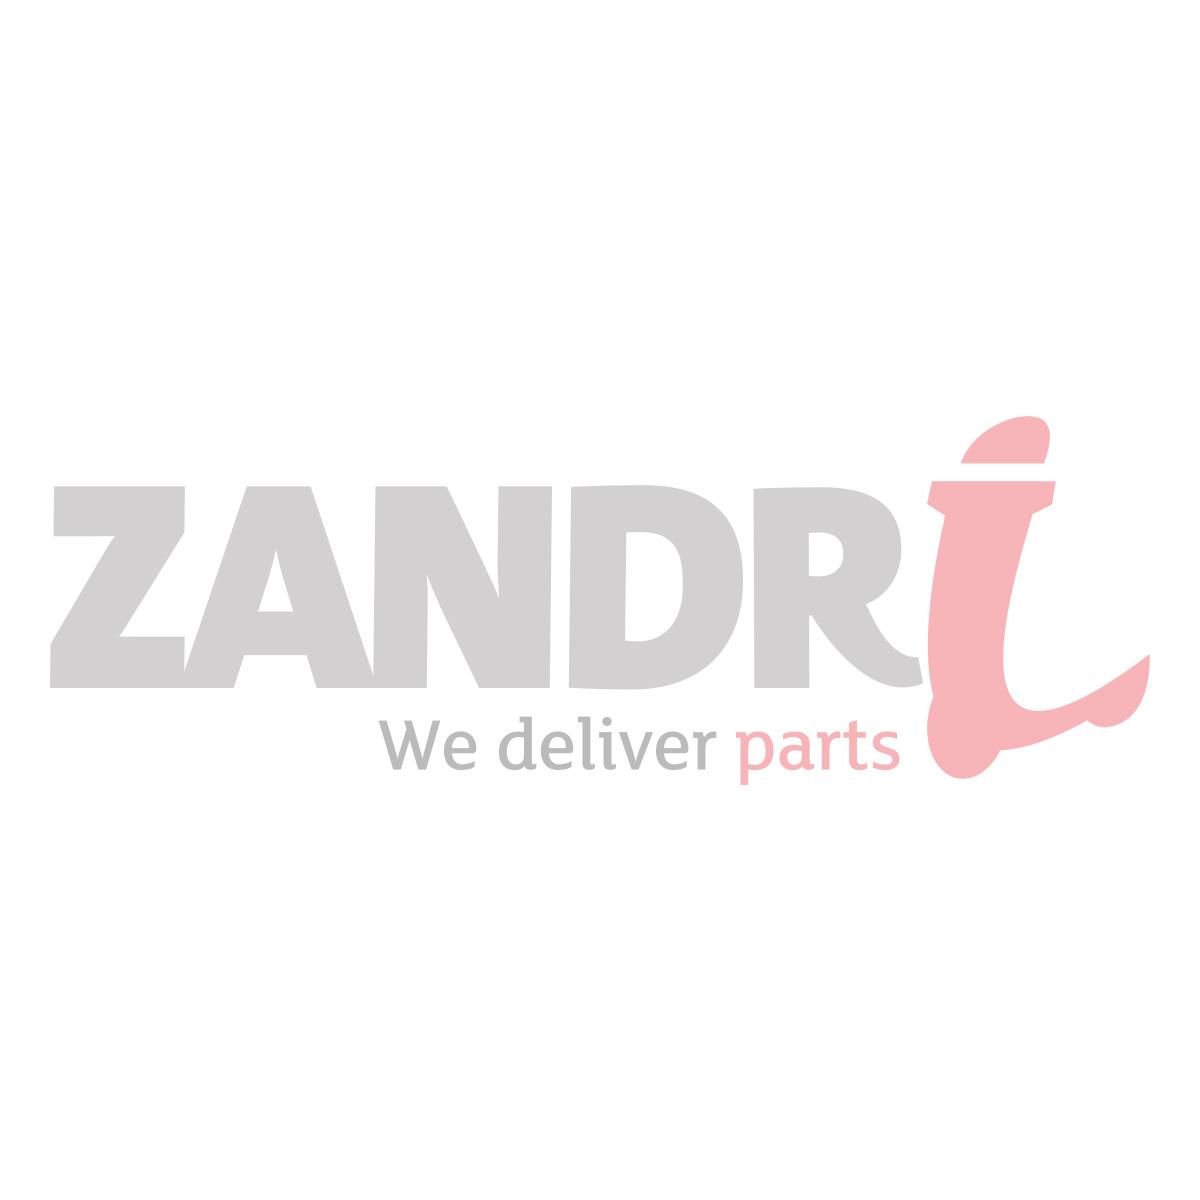 Startmotor agi/retro/tori/fid/orb/china4t/sco gy6 e0706bz